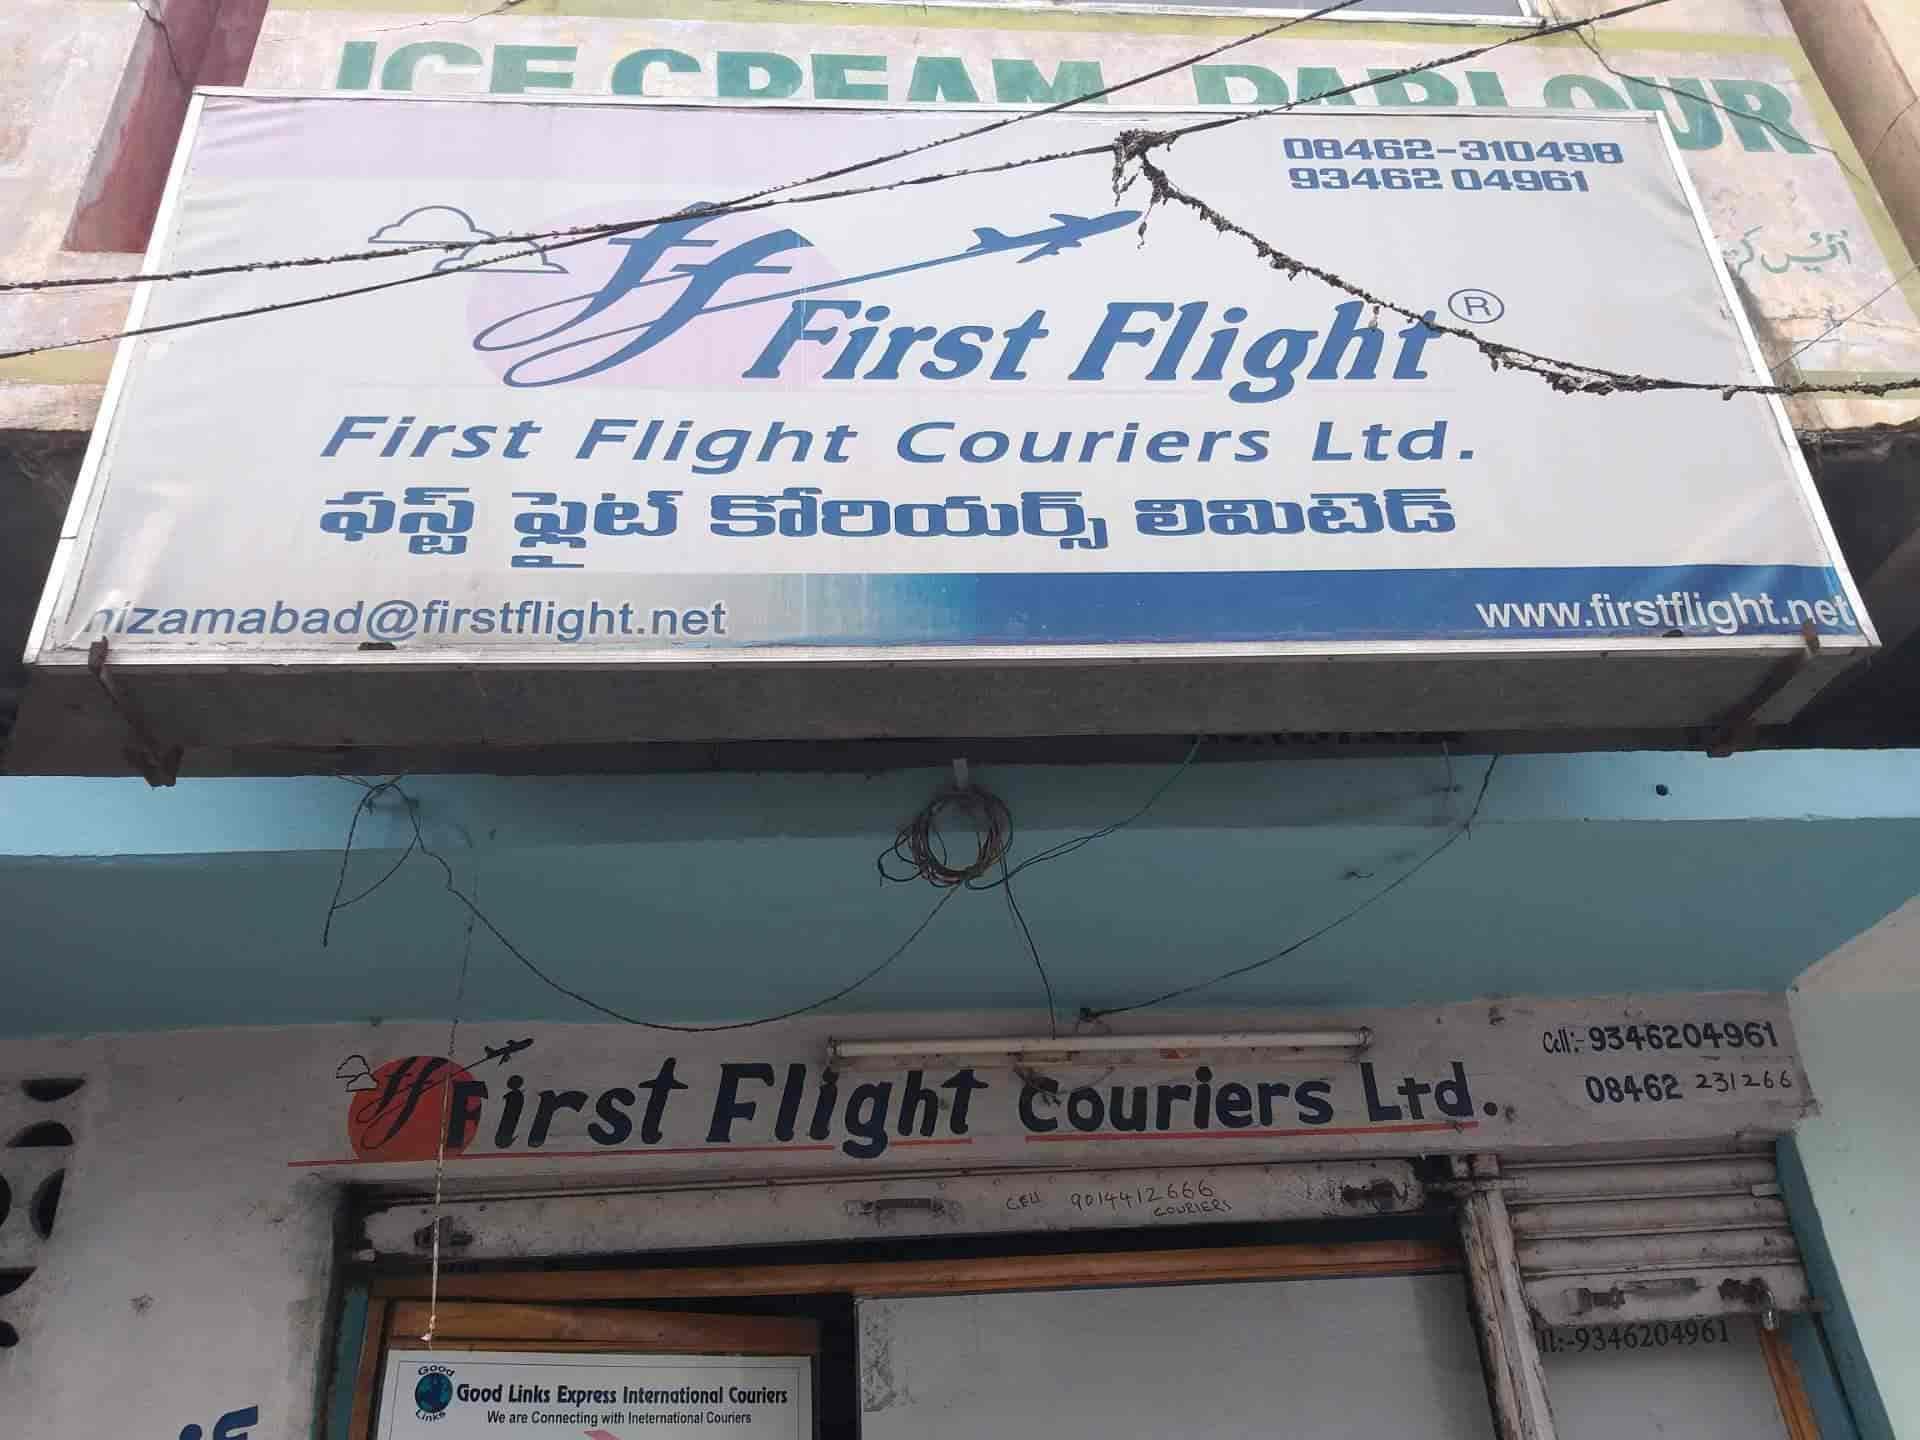 First Flight Couriers Ltd, Nizamabad Railway Station